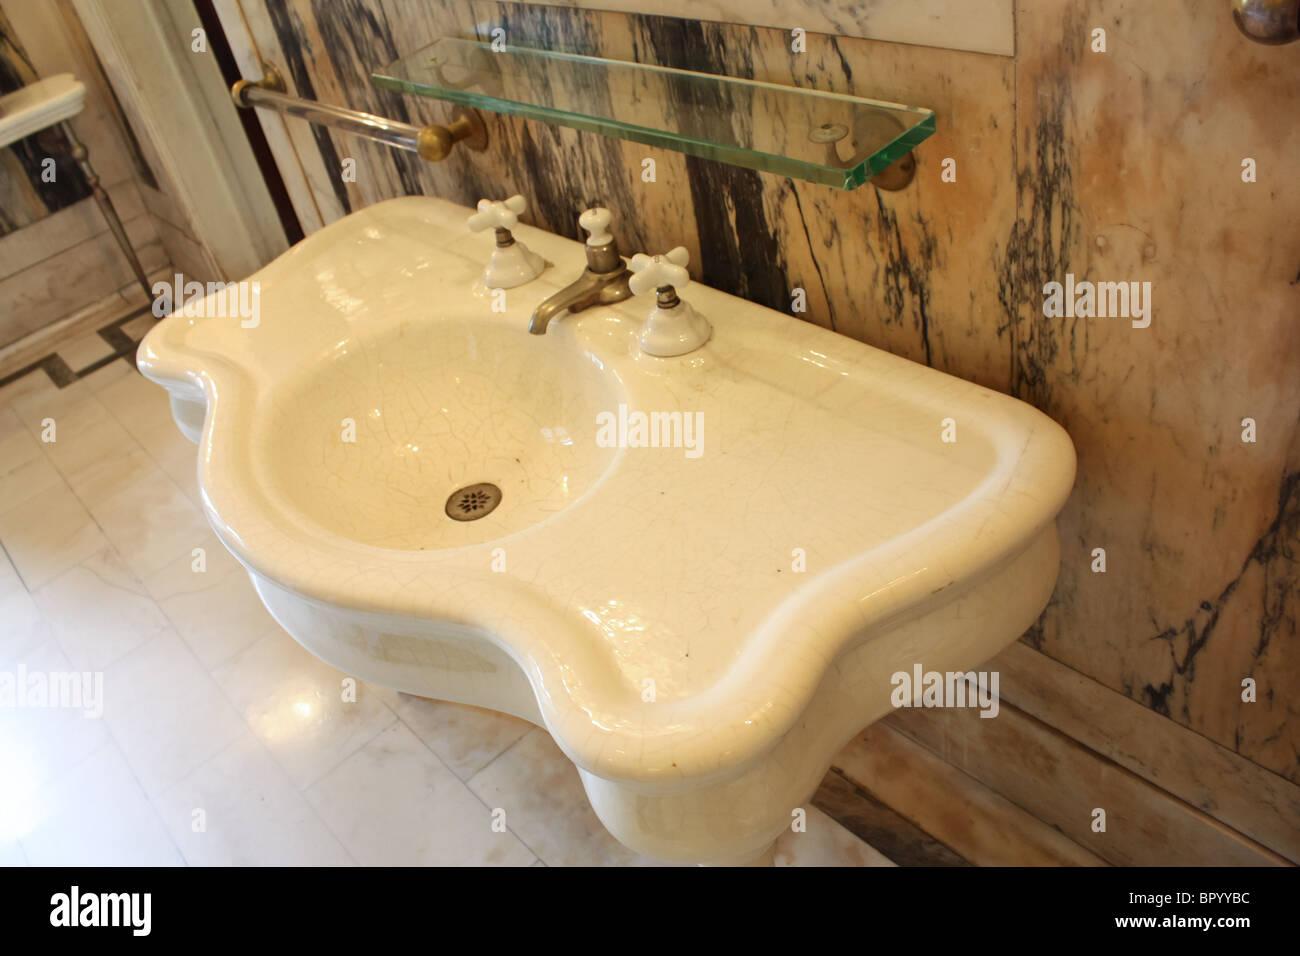 vintage retro white bathroom sink - Stock Image